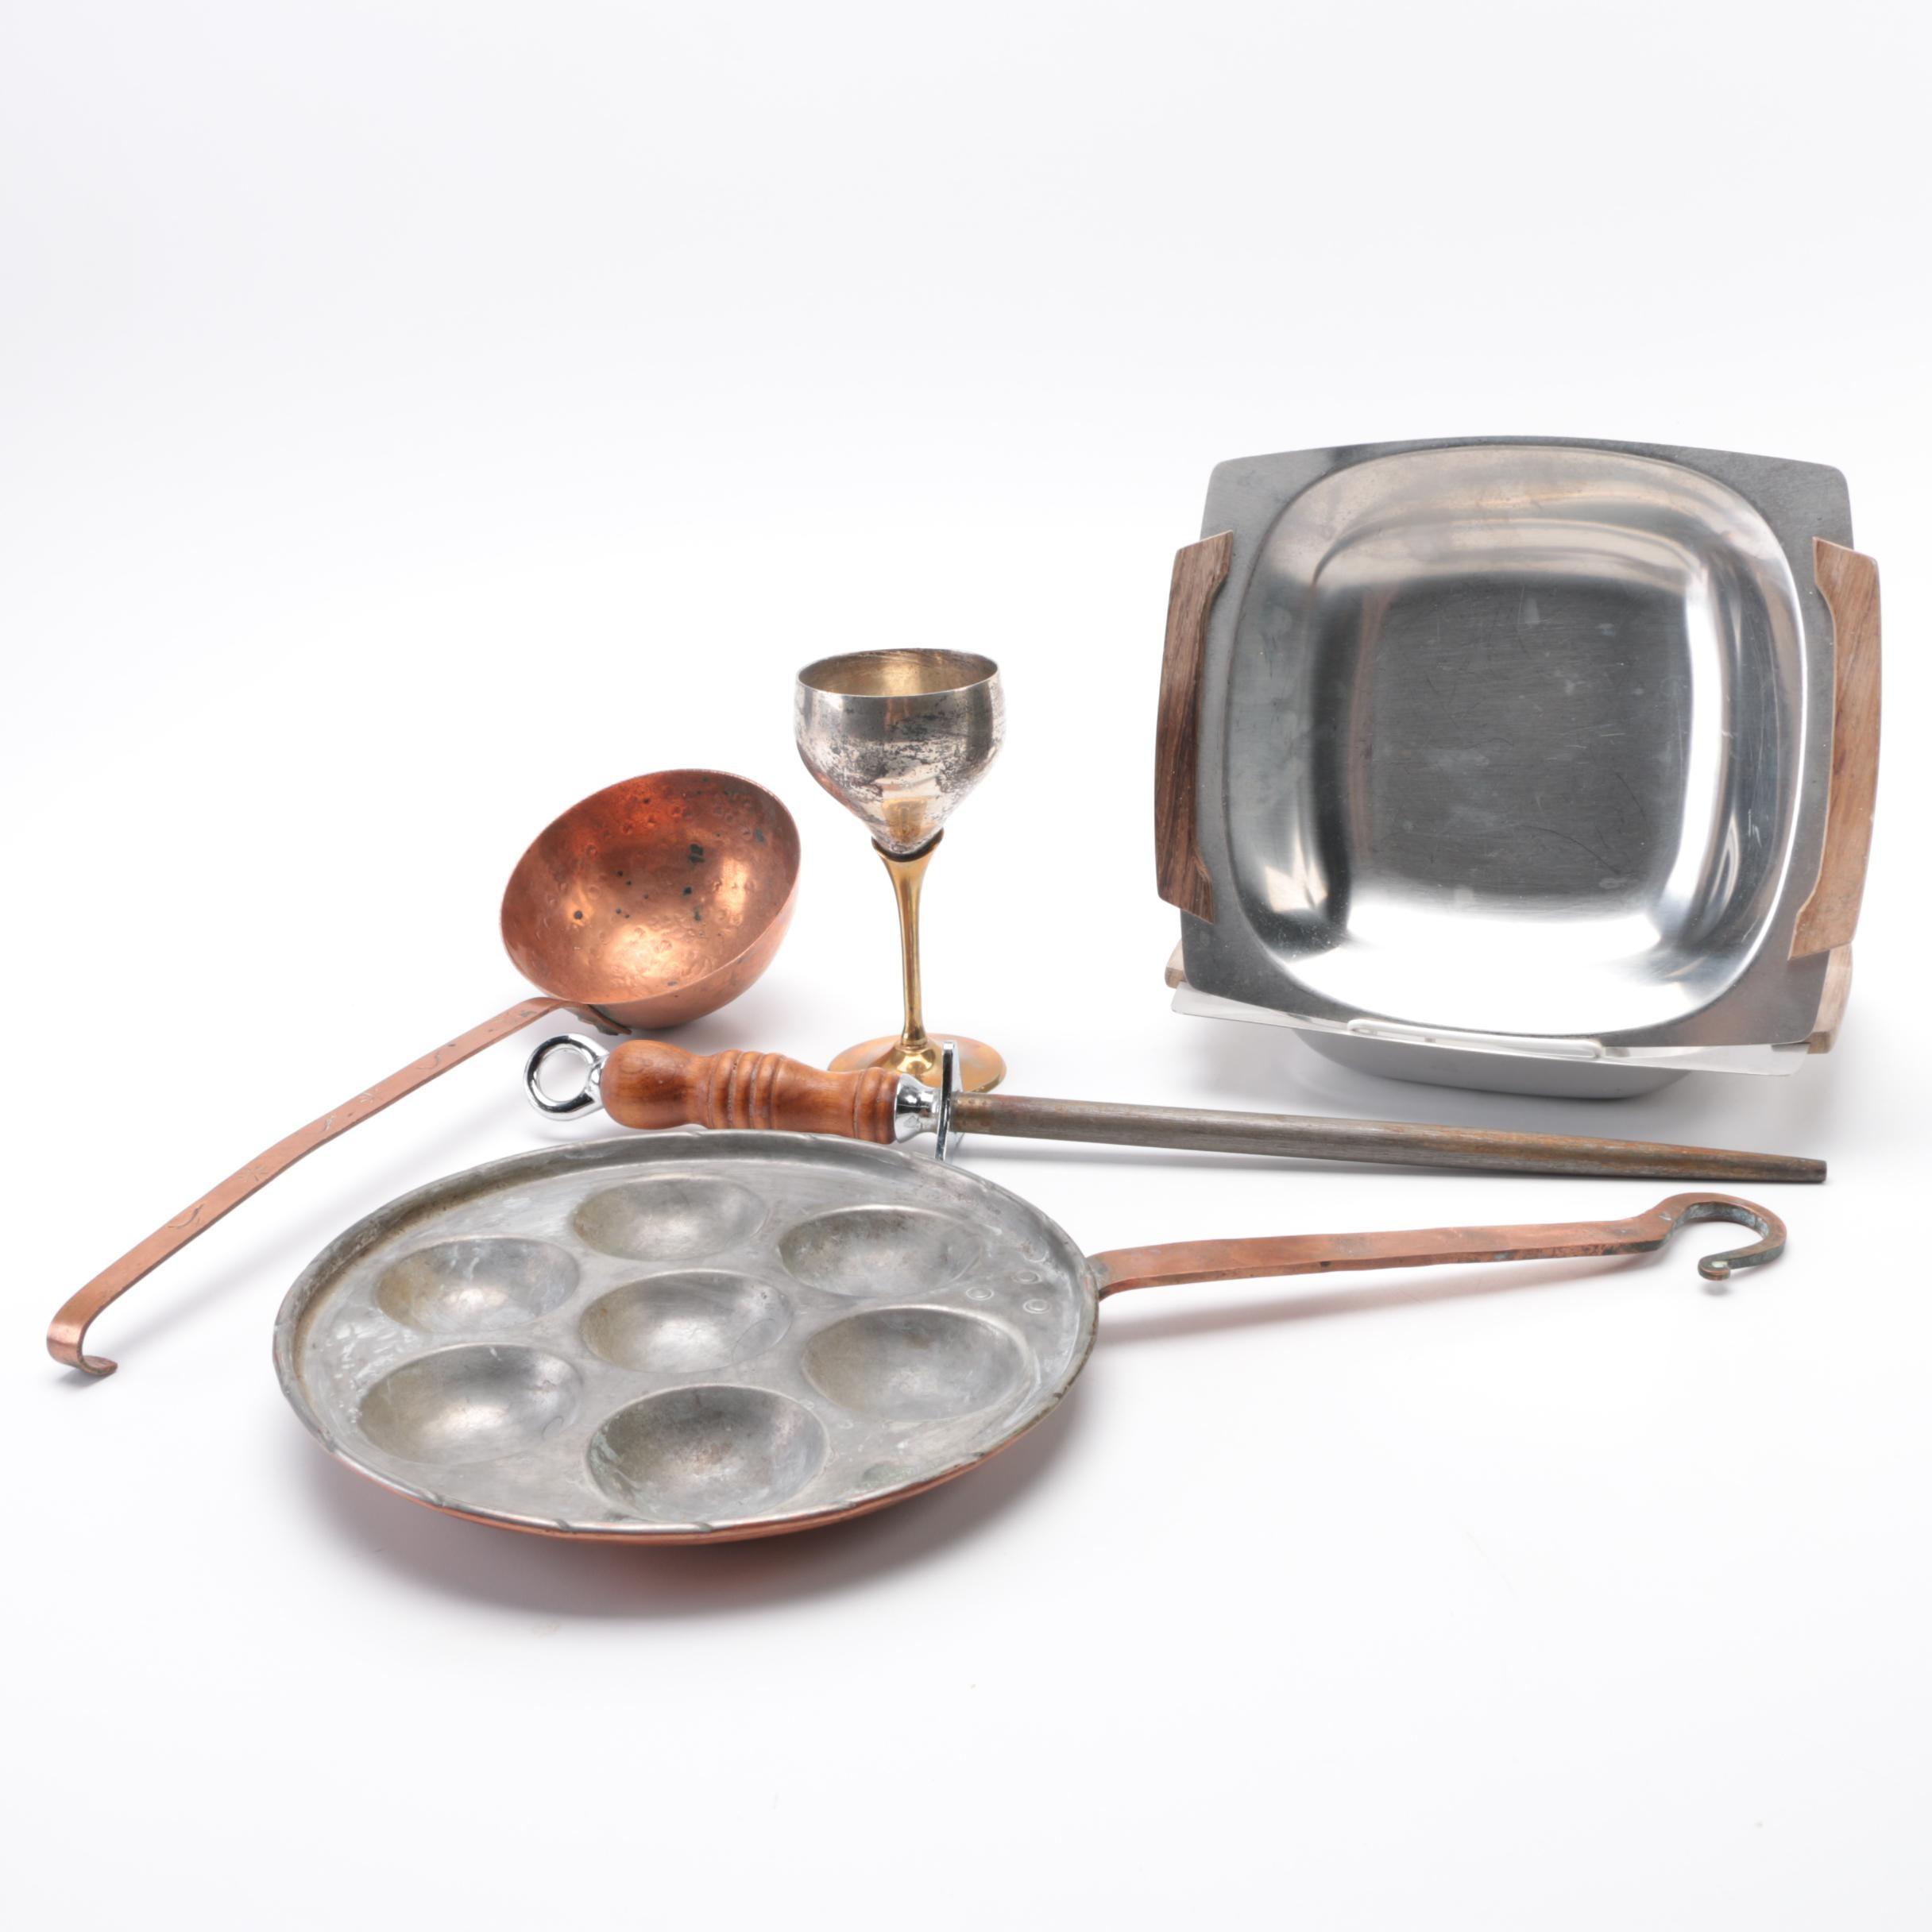 Assortment of Metal Kitchen Serveware